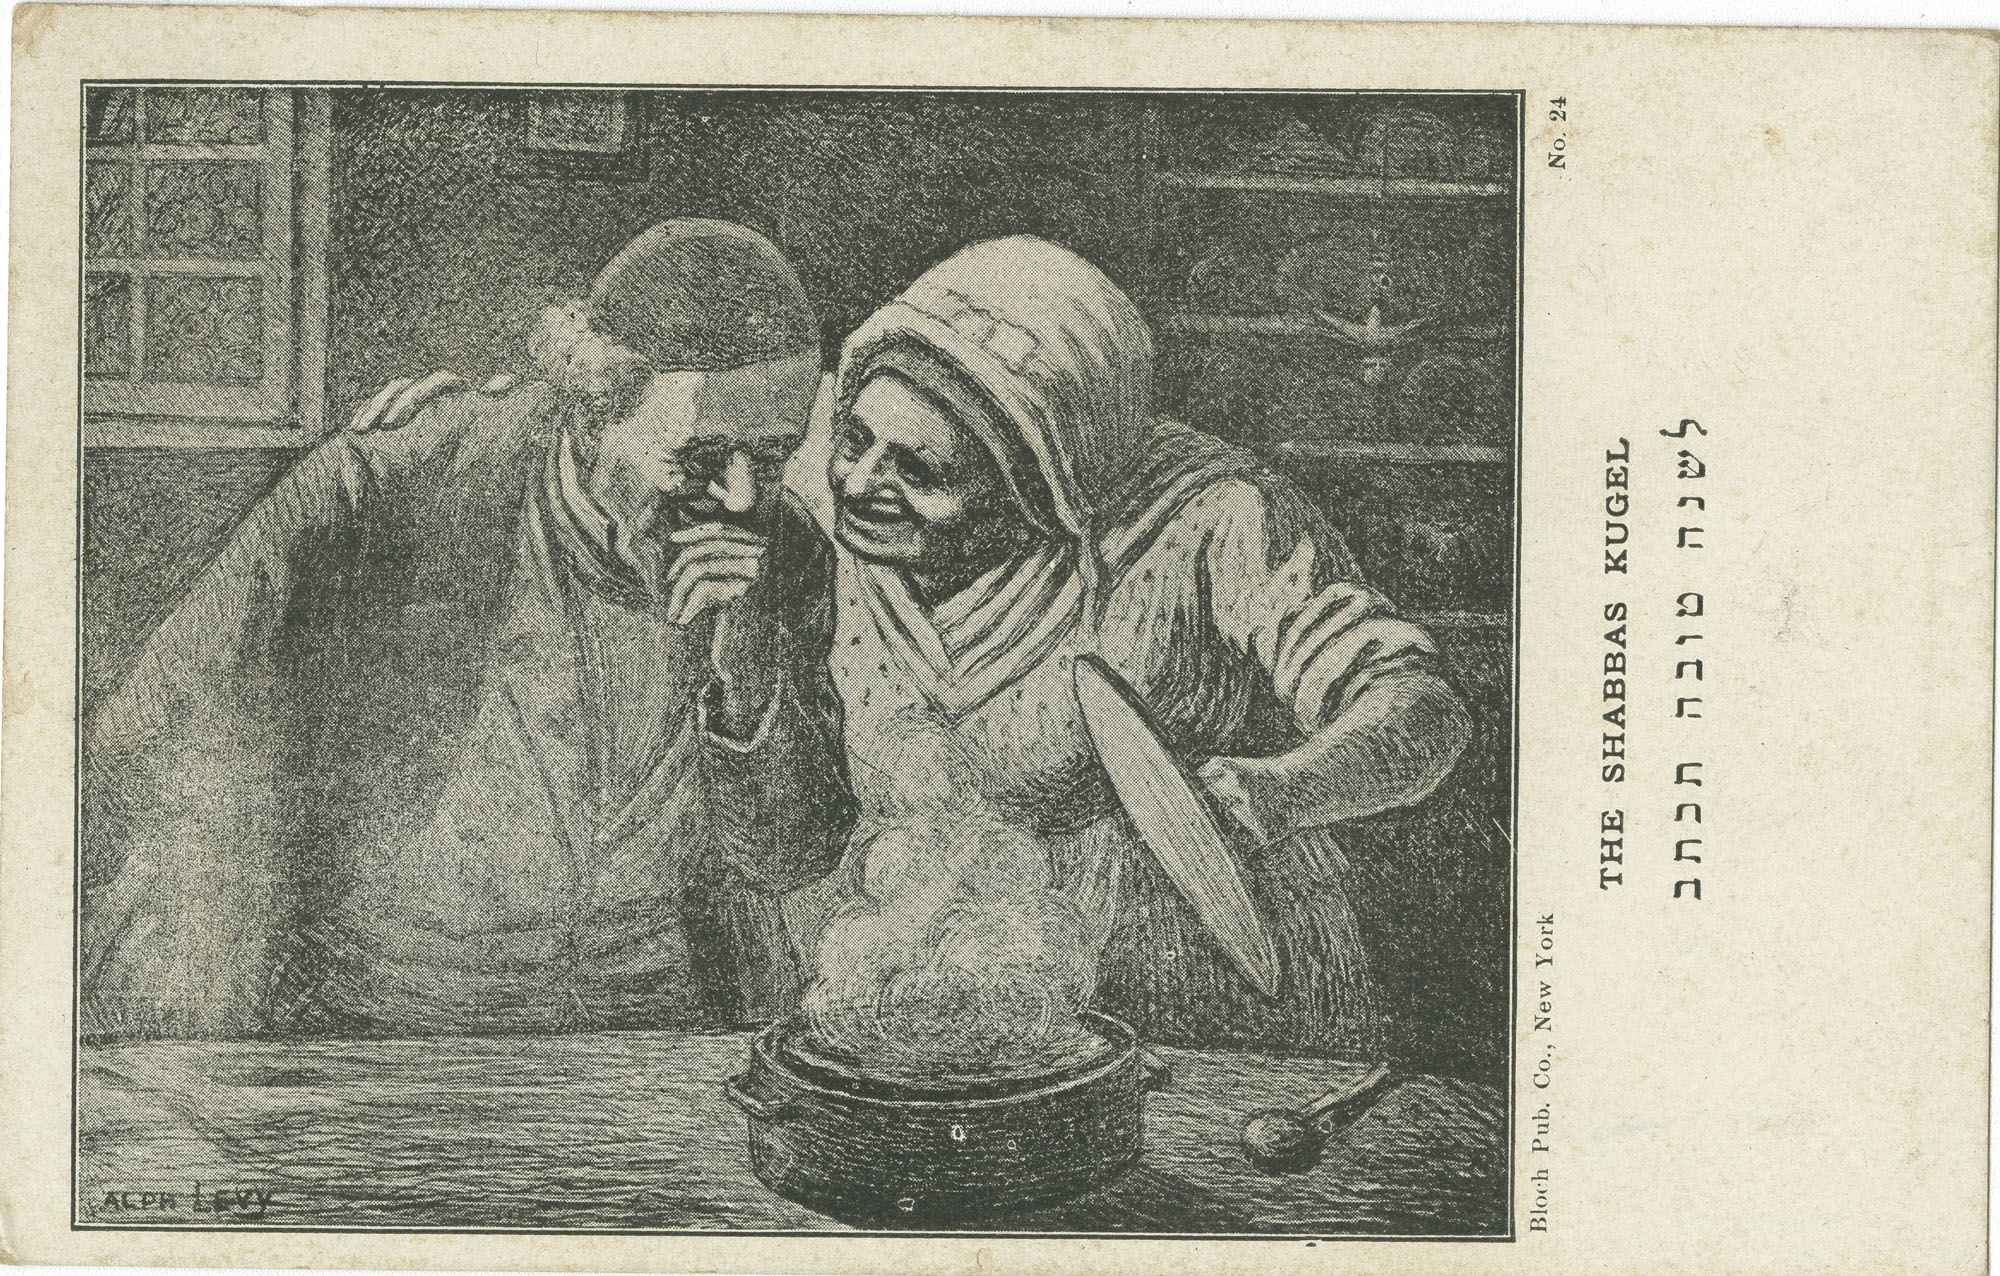 The Shabbas Kugel / לשנה טובה תכתב